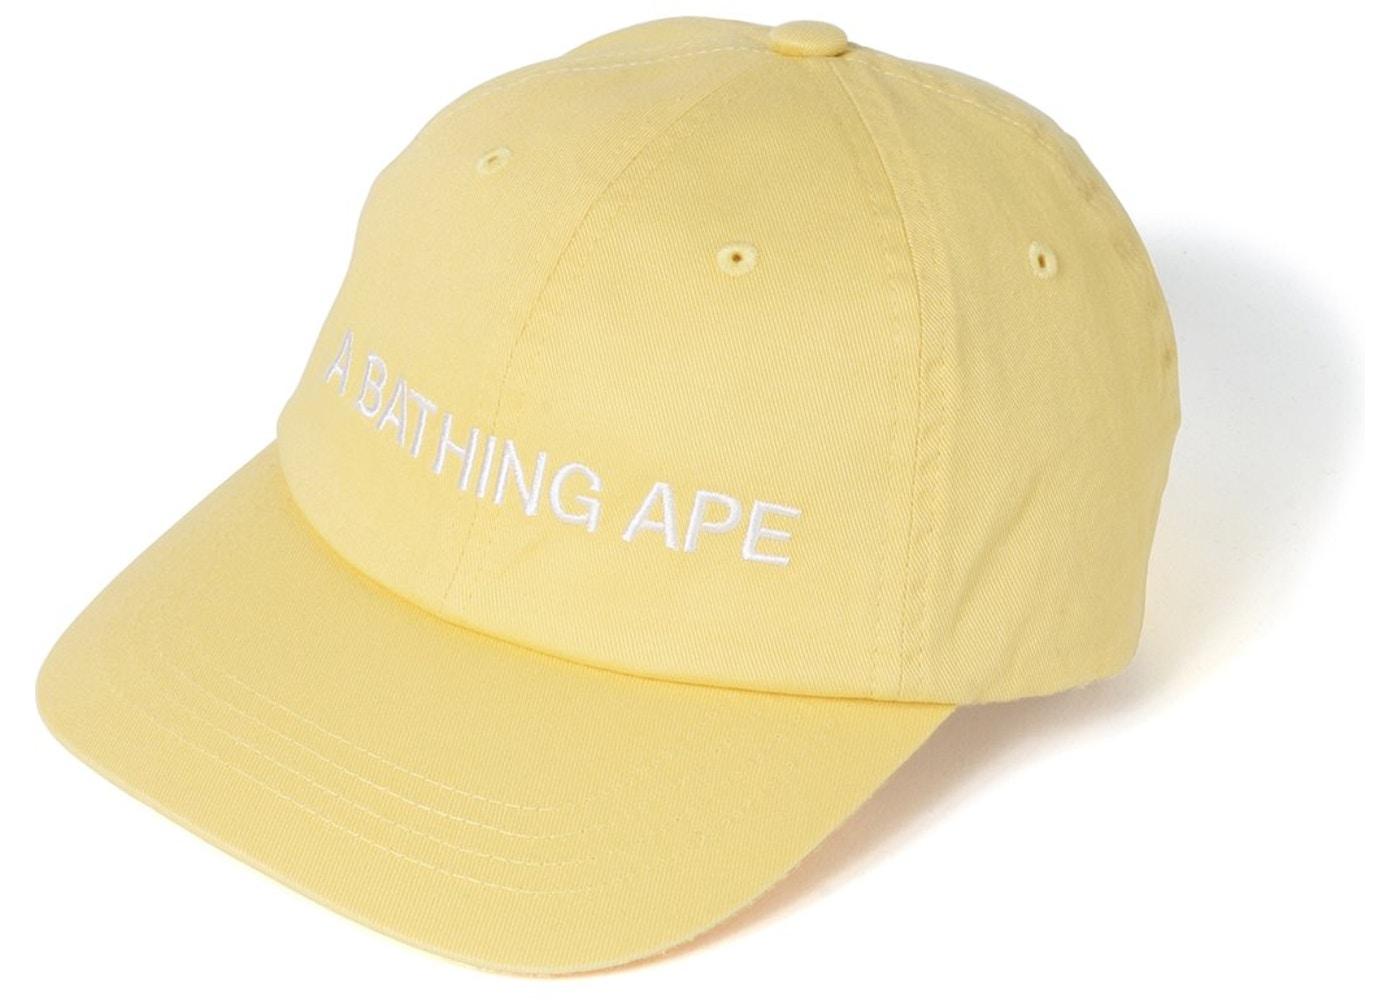 ae585d2b Streetwear - Bape Headwear - Price Premium